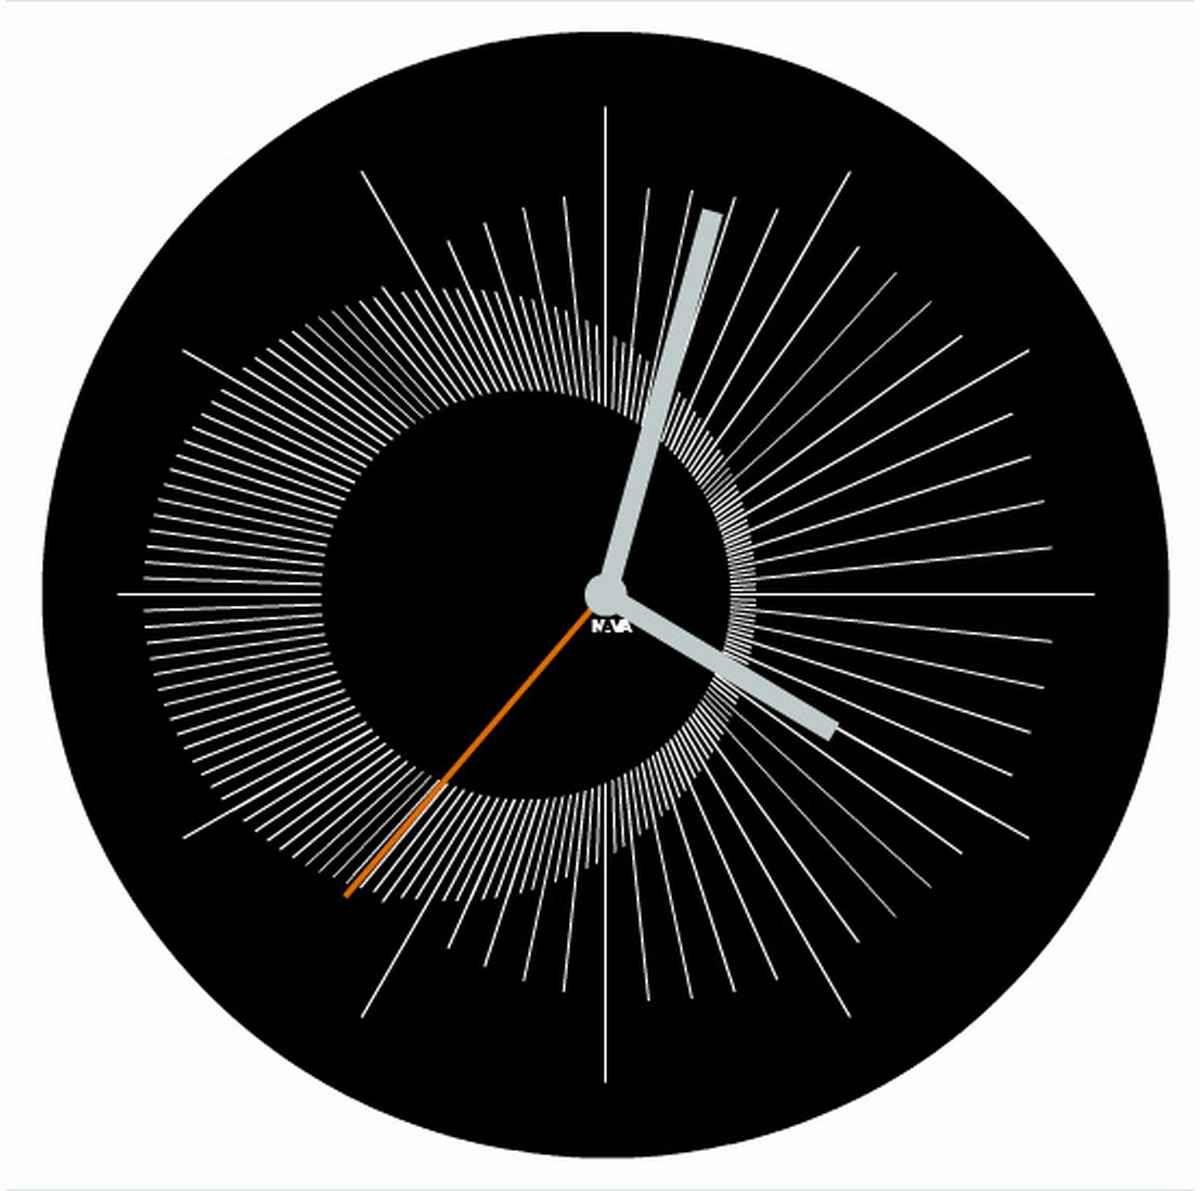 Unique clocks clocks furniture original wall clocks by dario unique clocks clocks furniture original wall clocks by dario serio unusual clock amipublicfo Gallery